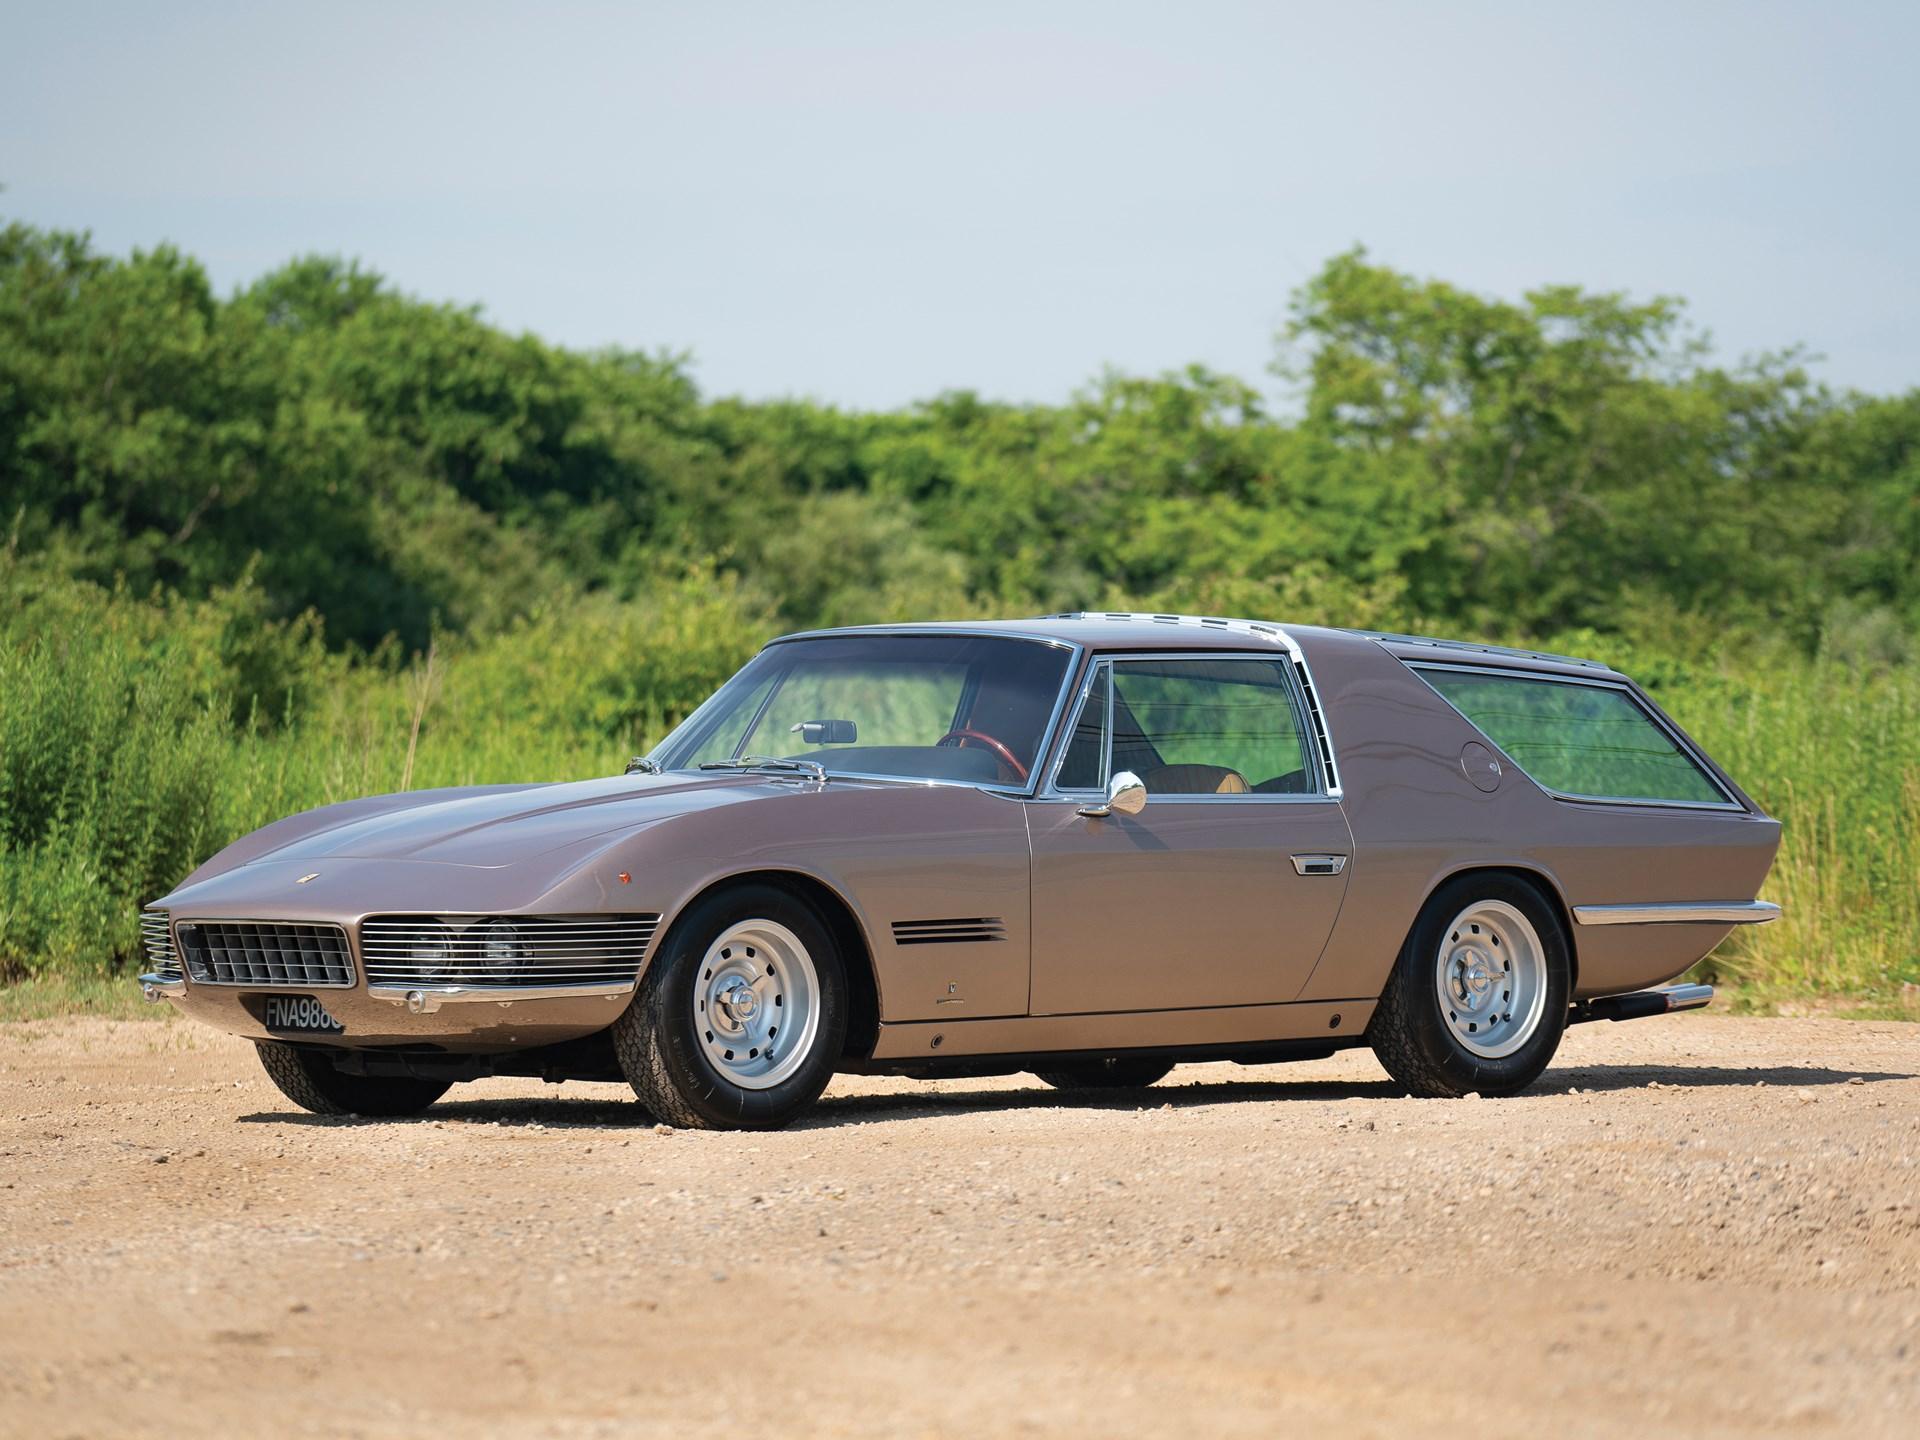 Sorry, but this 1965 Ferrari 330 GT breadvan just wins thumbnail